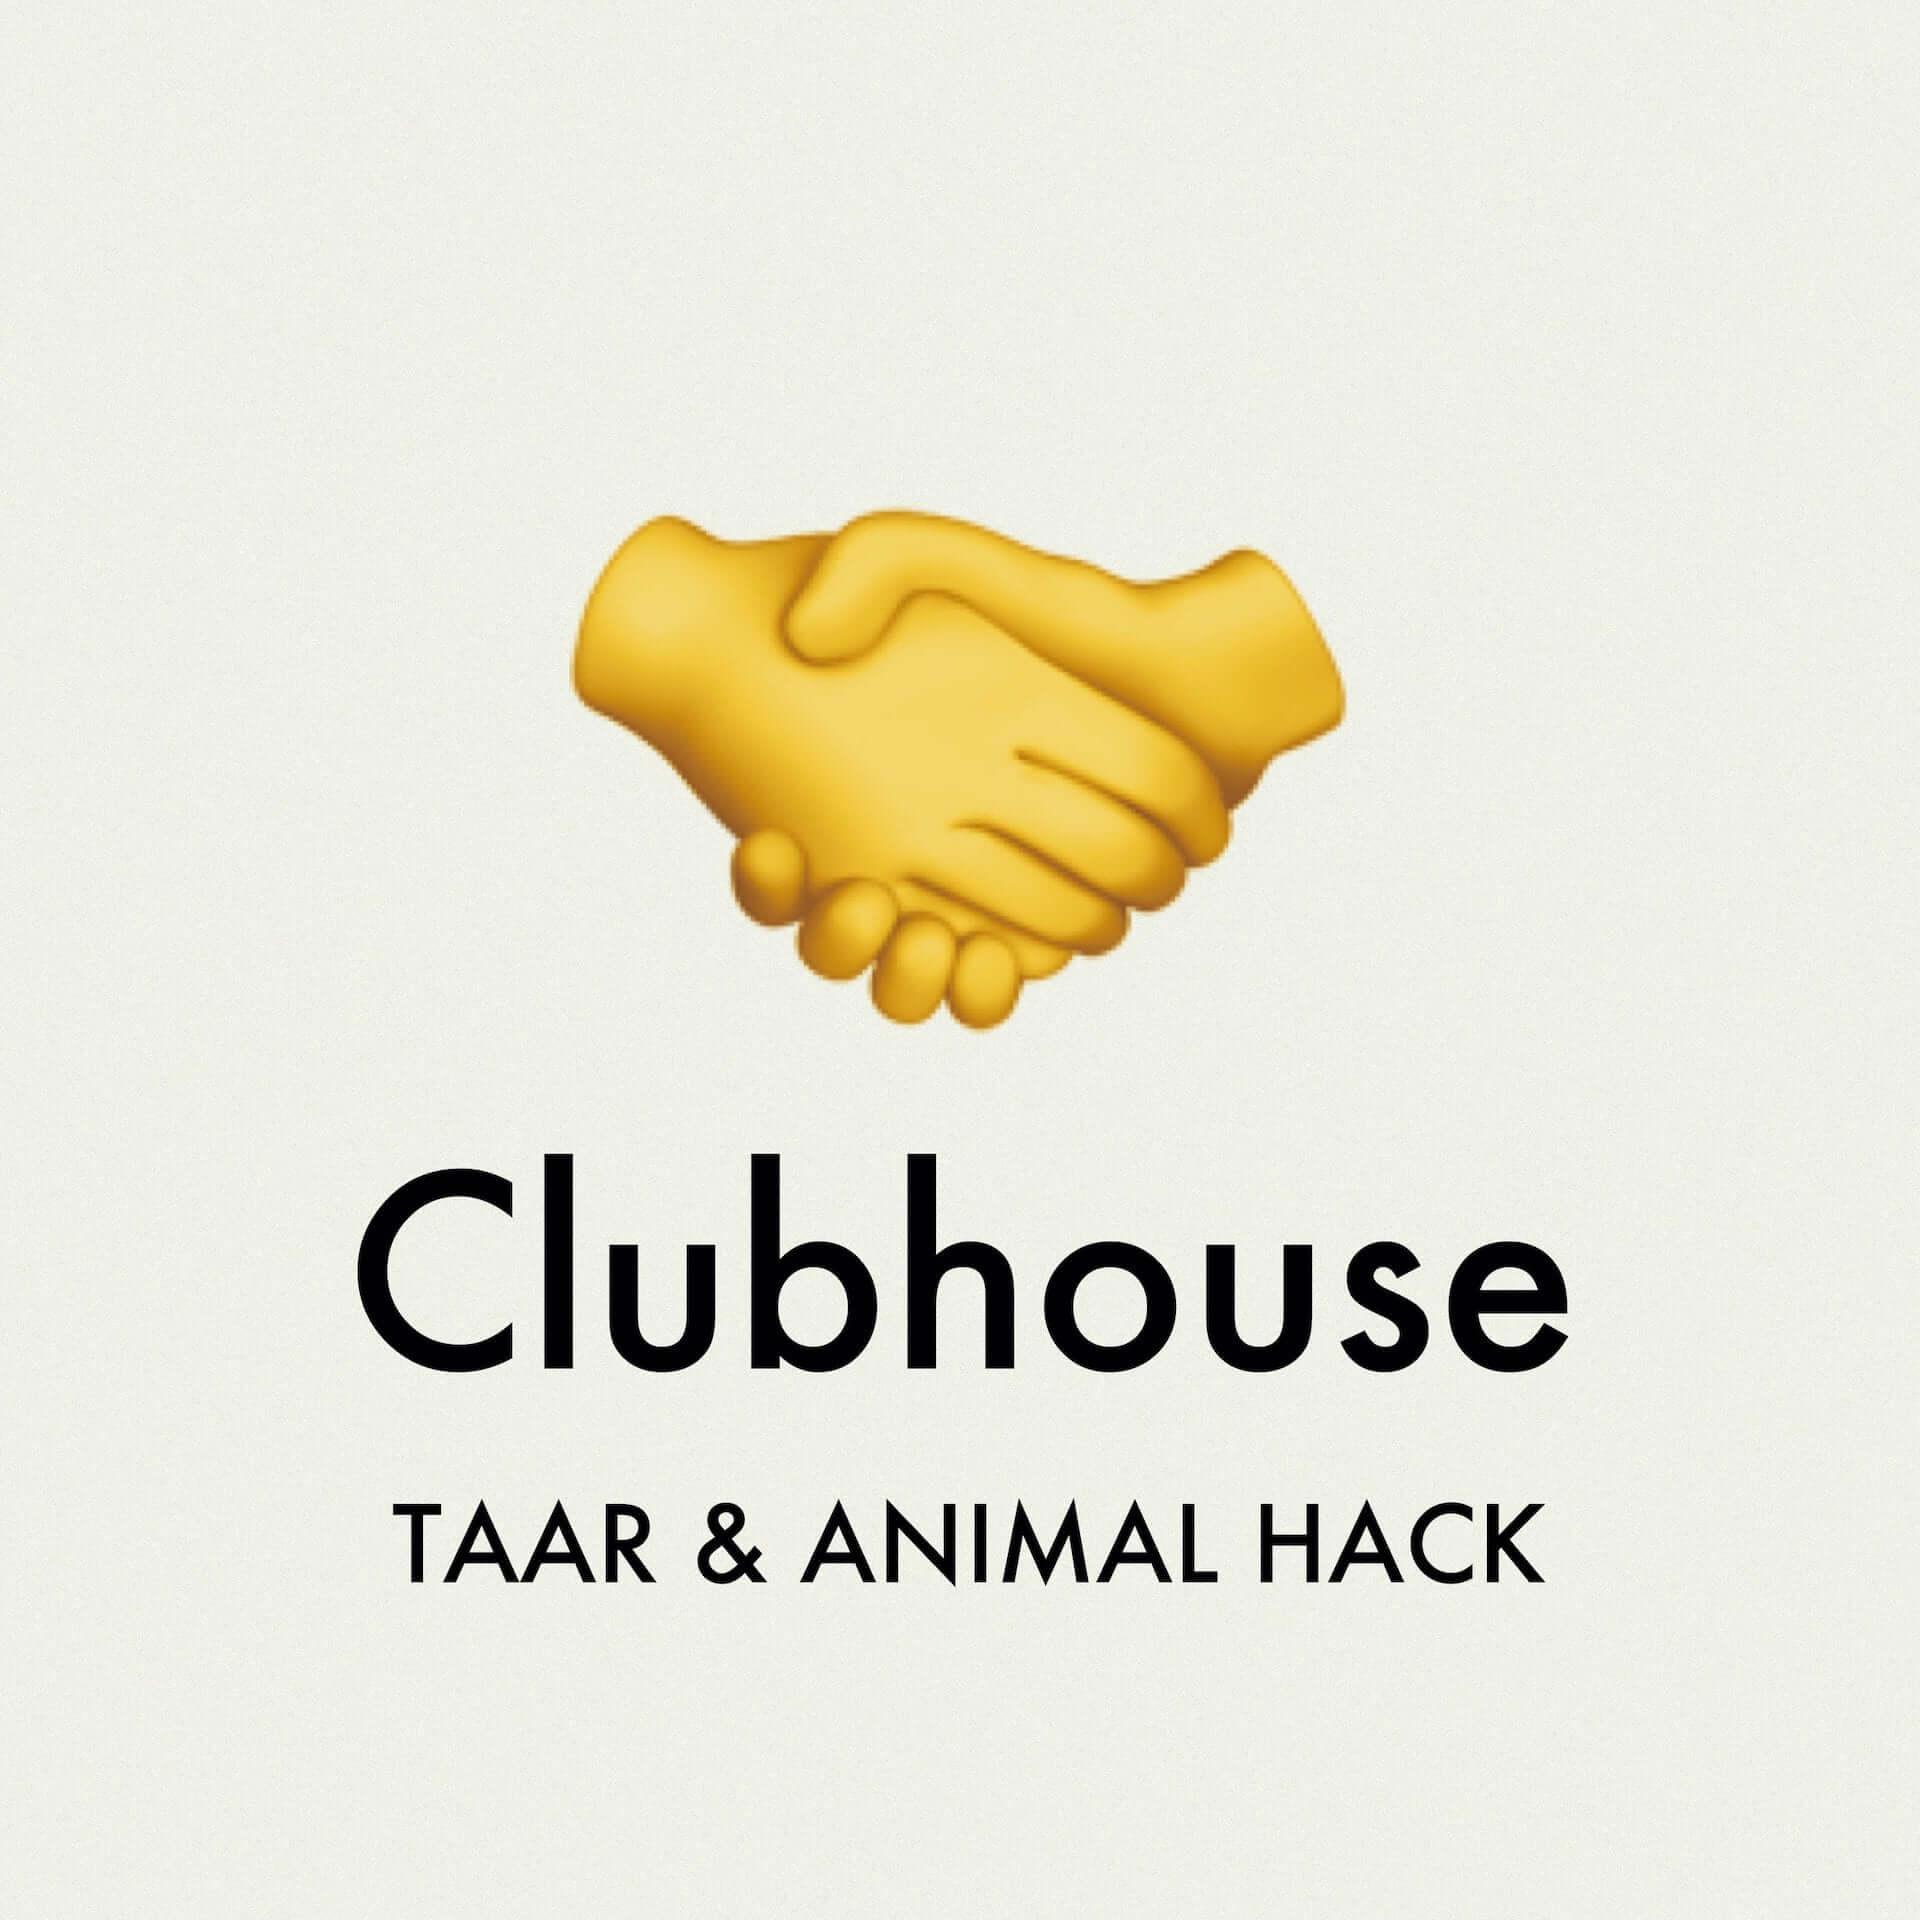 "「Clubhouse」で共同制作されたTAARとANIMAL HACKの新曲""Clubhouse""が今夜公開!Seiho、CHICO CARLITO、ハセガワダイスケらが参加 music210201_clubhouse-taar-masato_4-1920x1920"